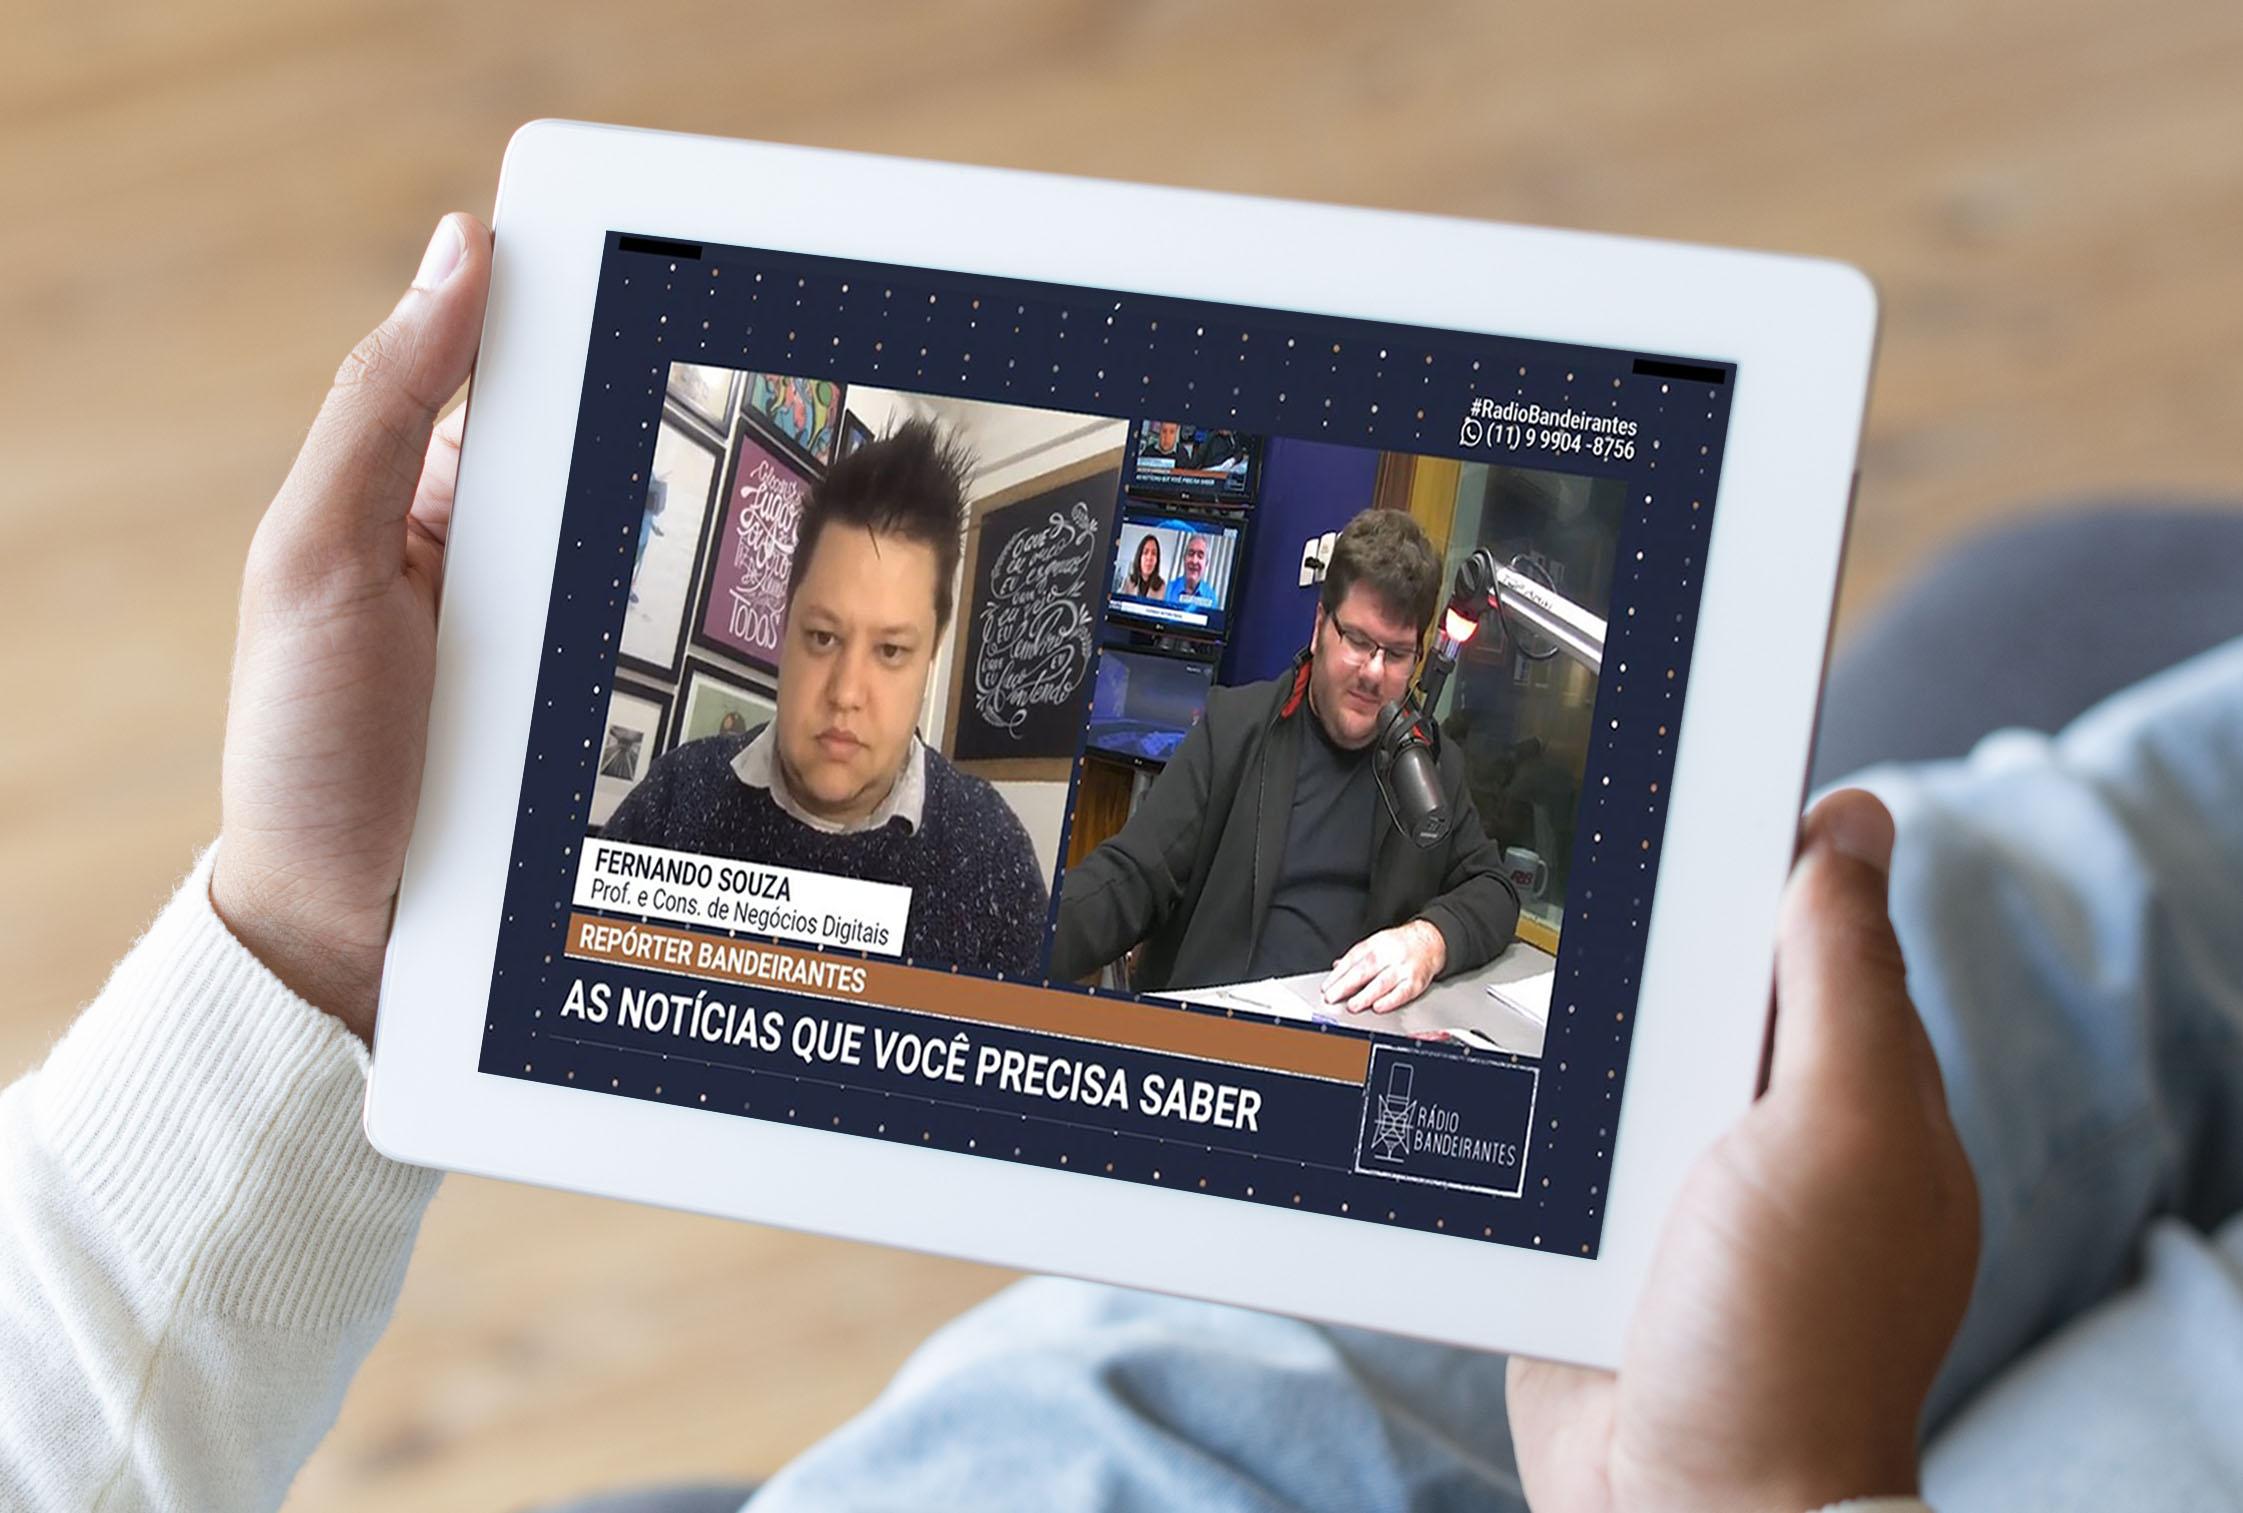 Entrevista – Consultor de negócios digitais analisa boicote ao Facebook- Band Uol